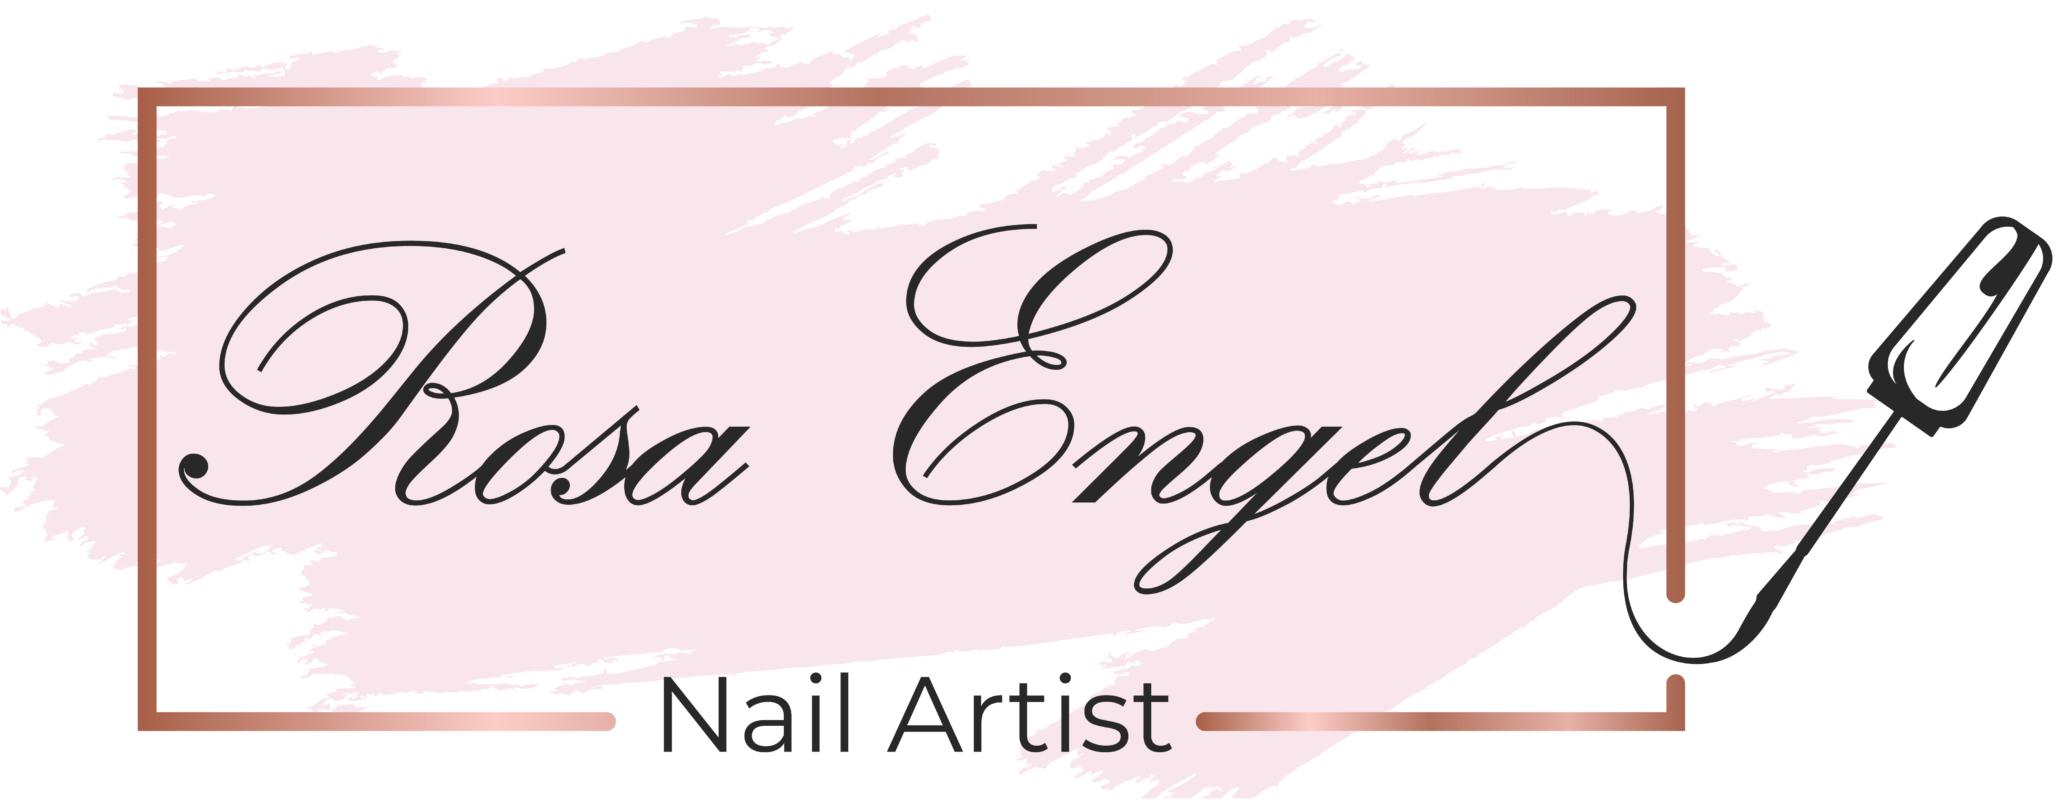 Rosa-Logo-Farbig-scaled-e1607866567476.jpg